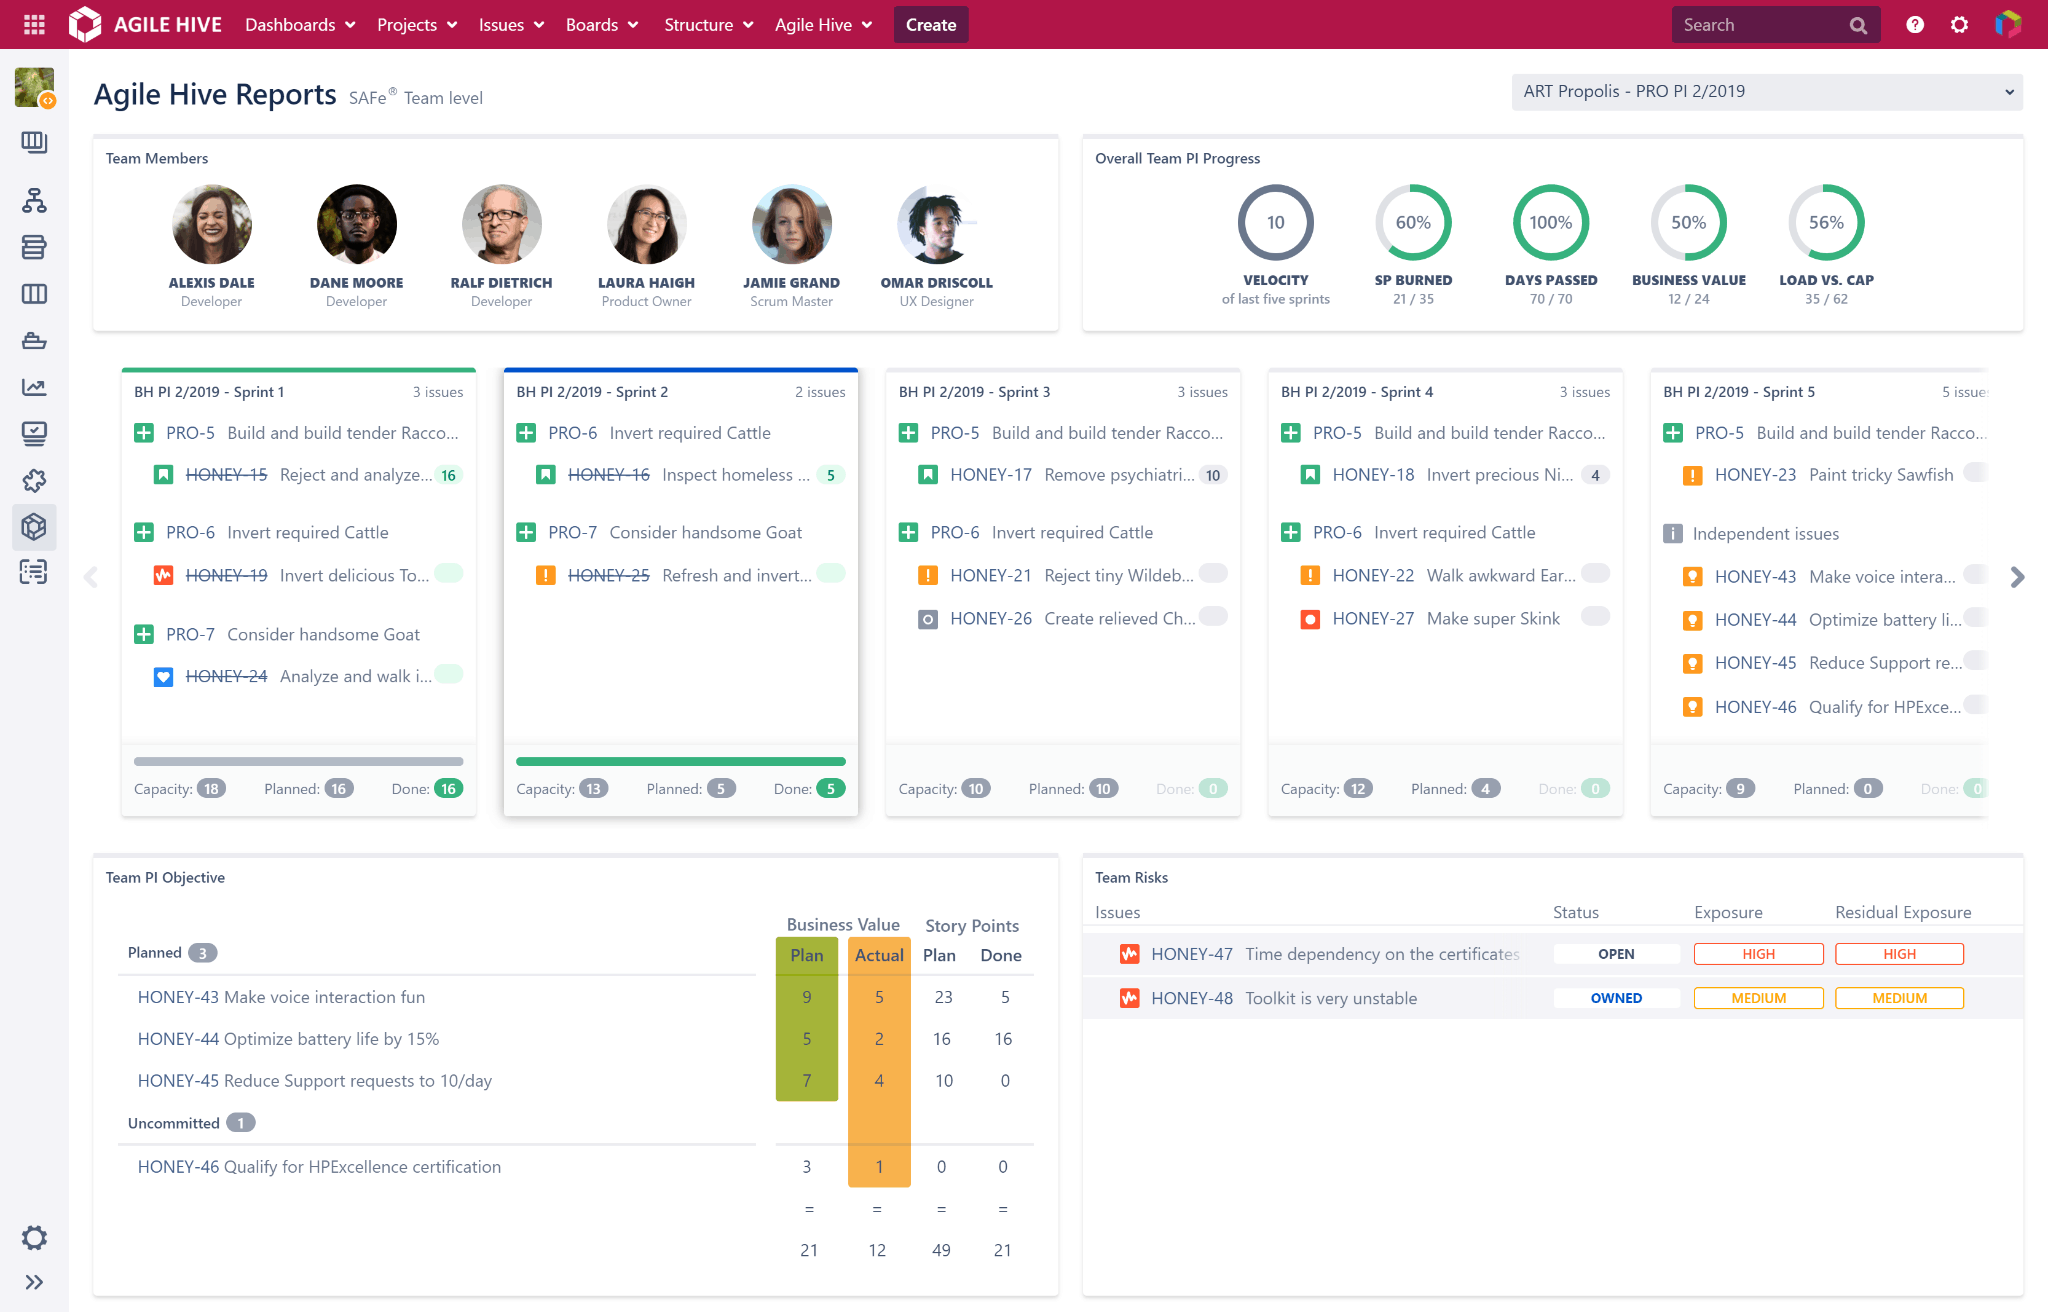 Agile Hive Team Report